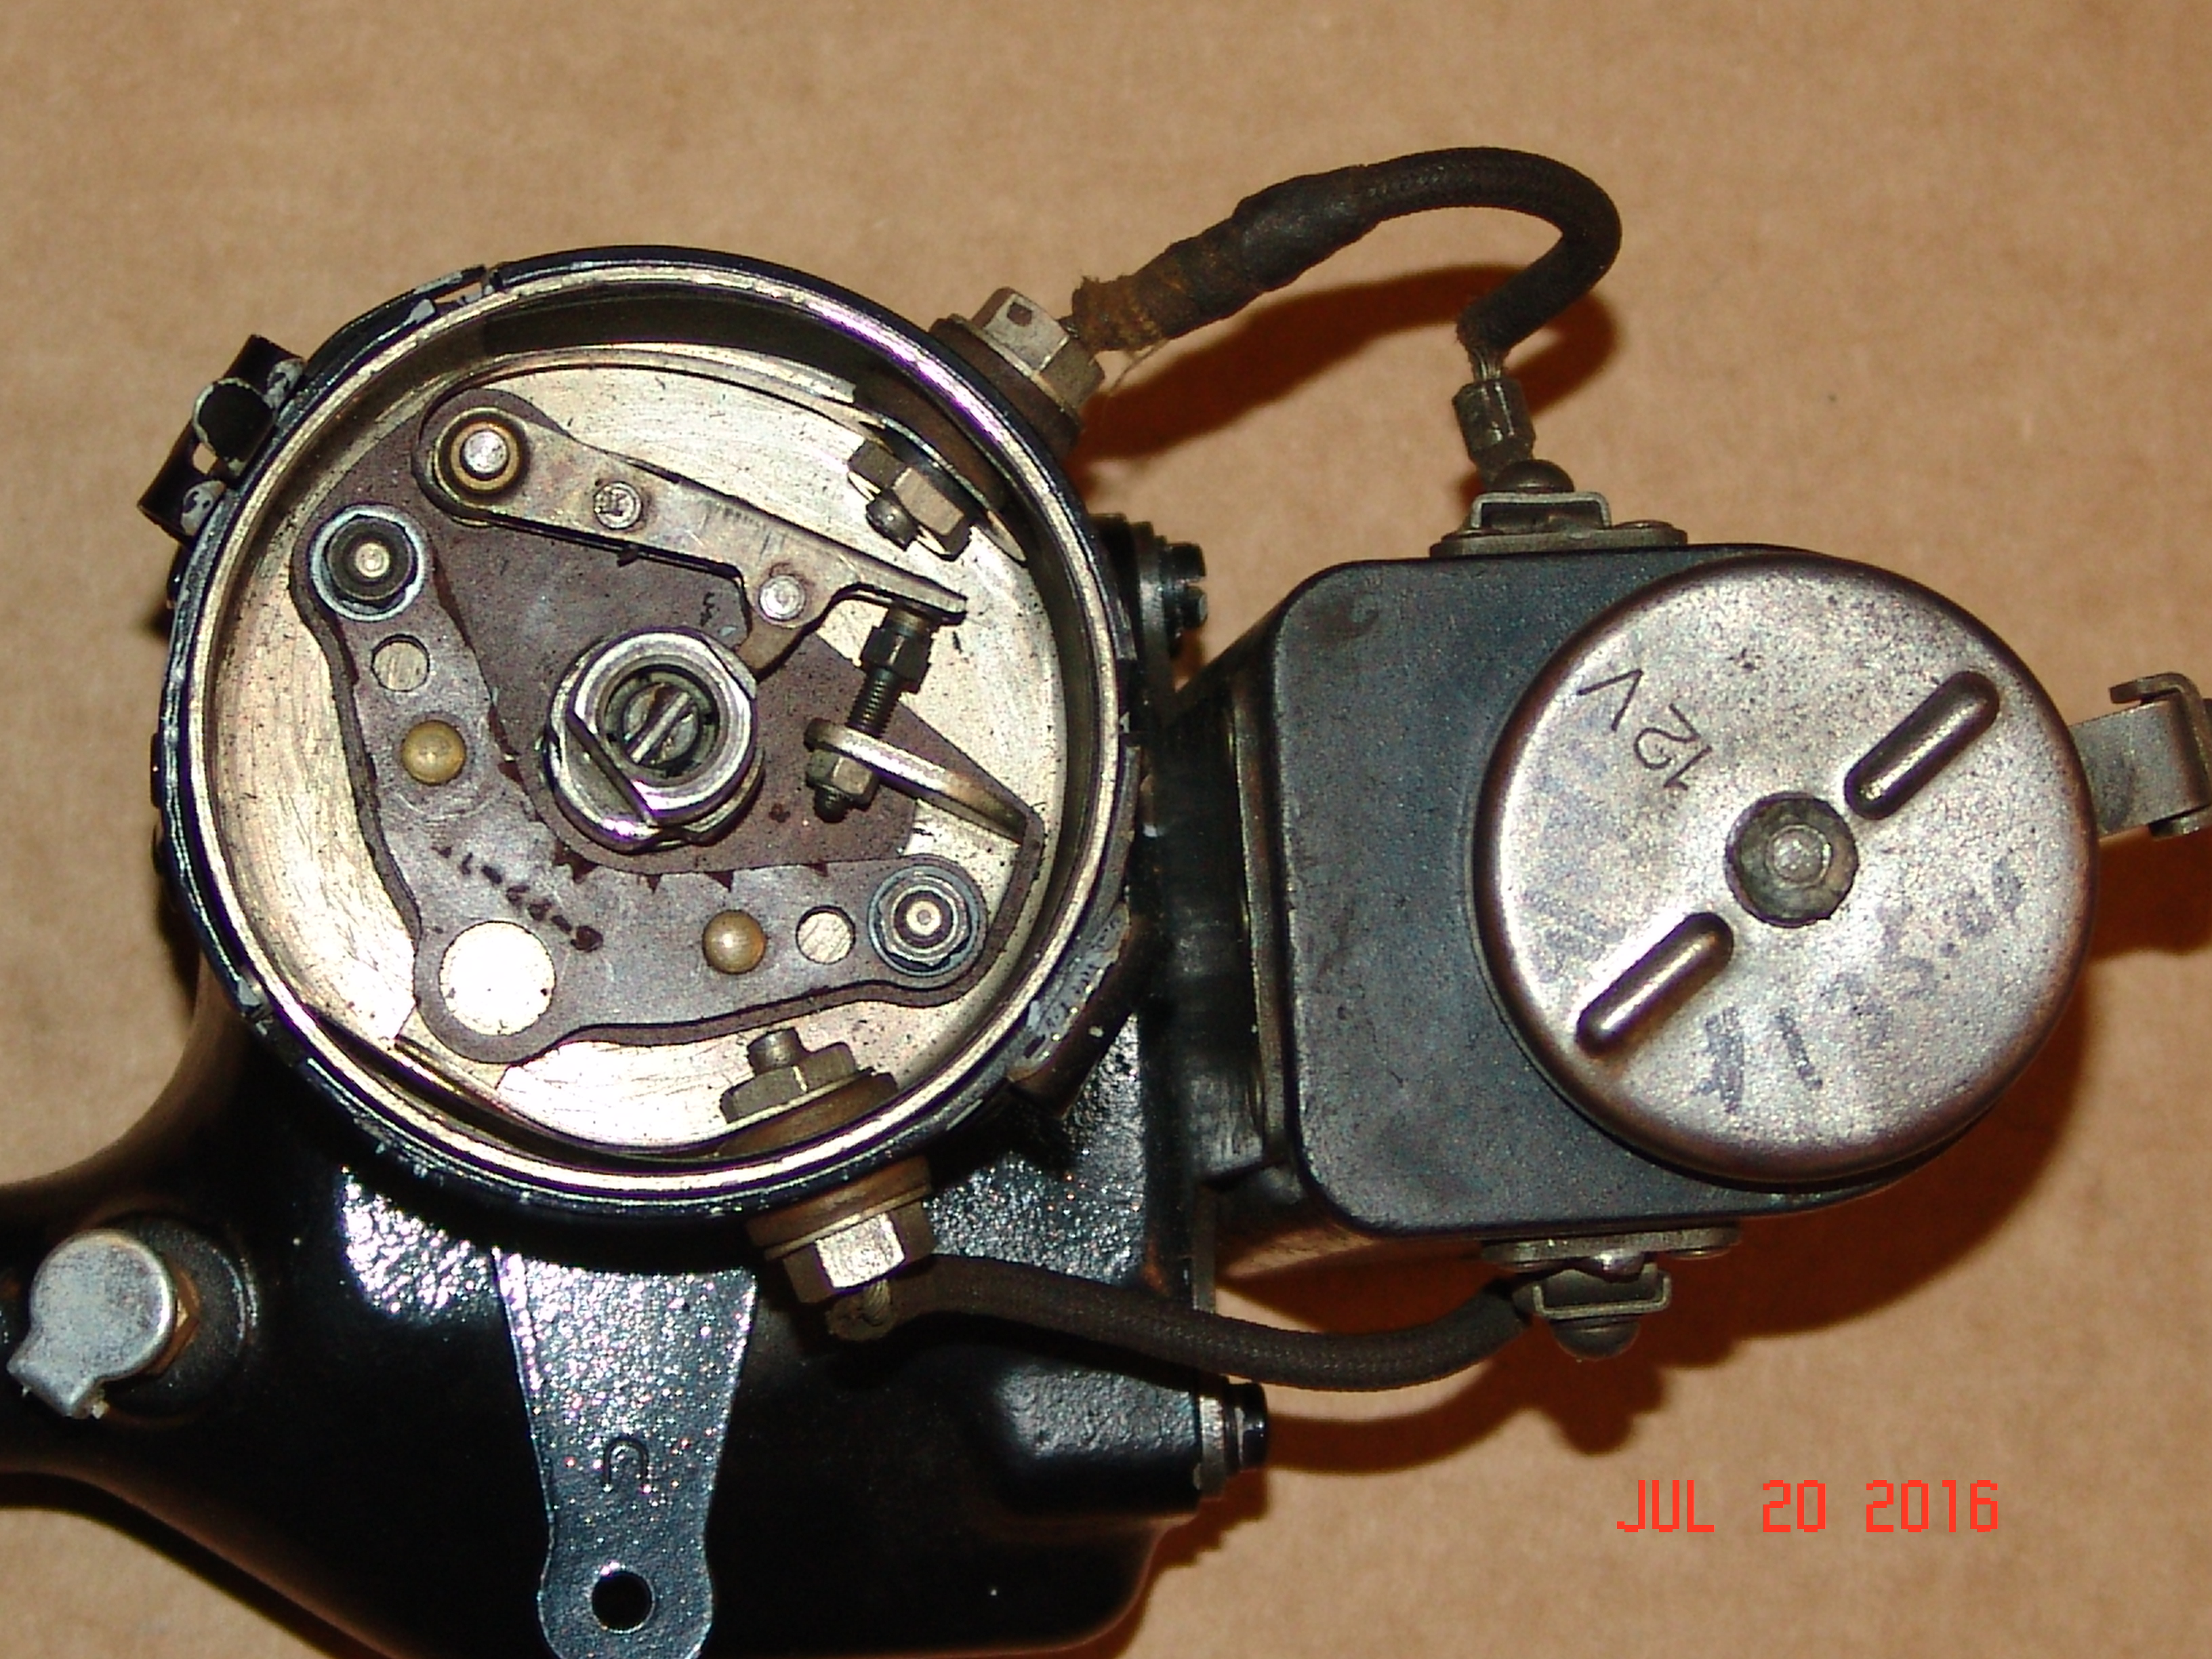 DSC05818.JPG